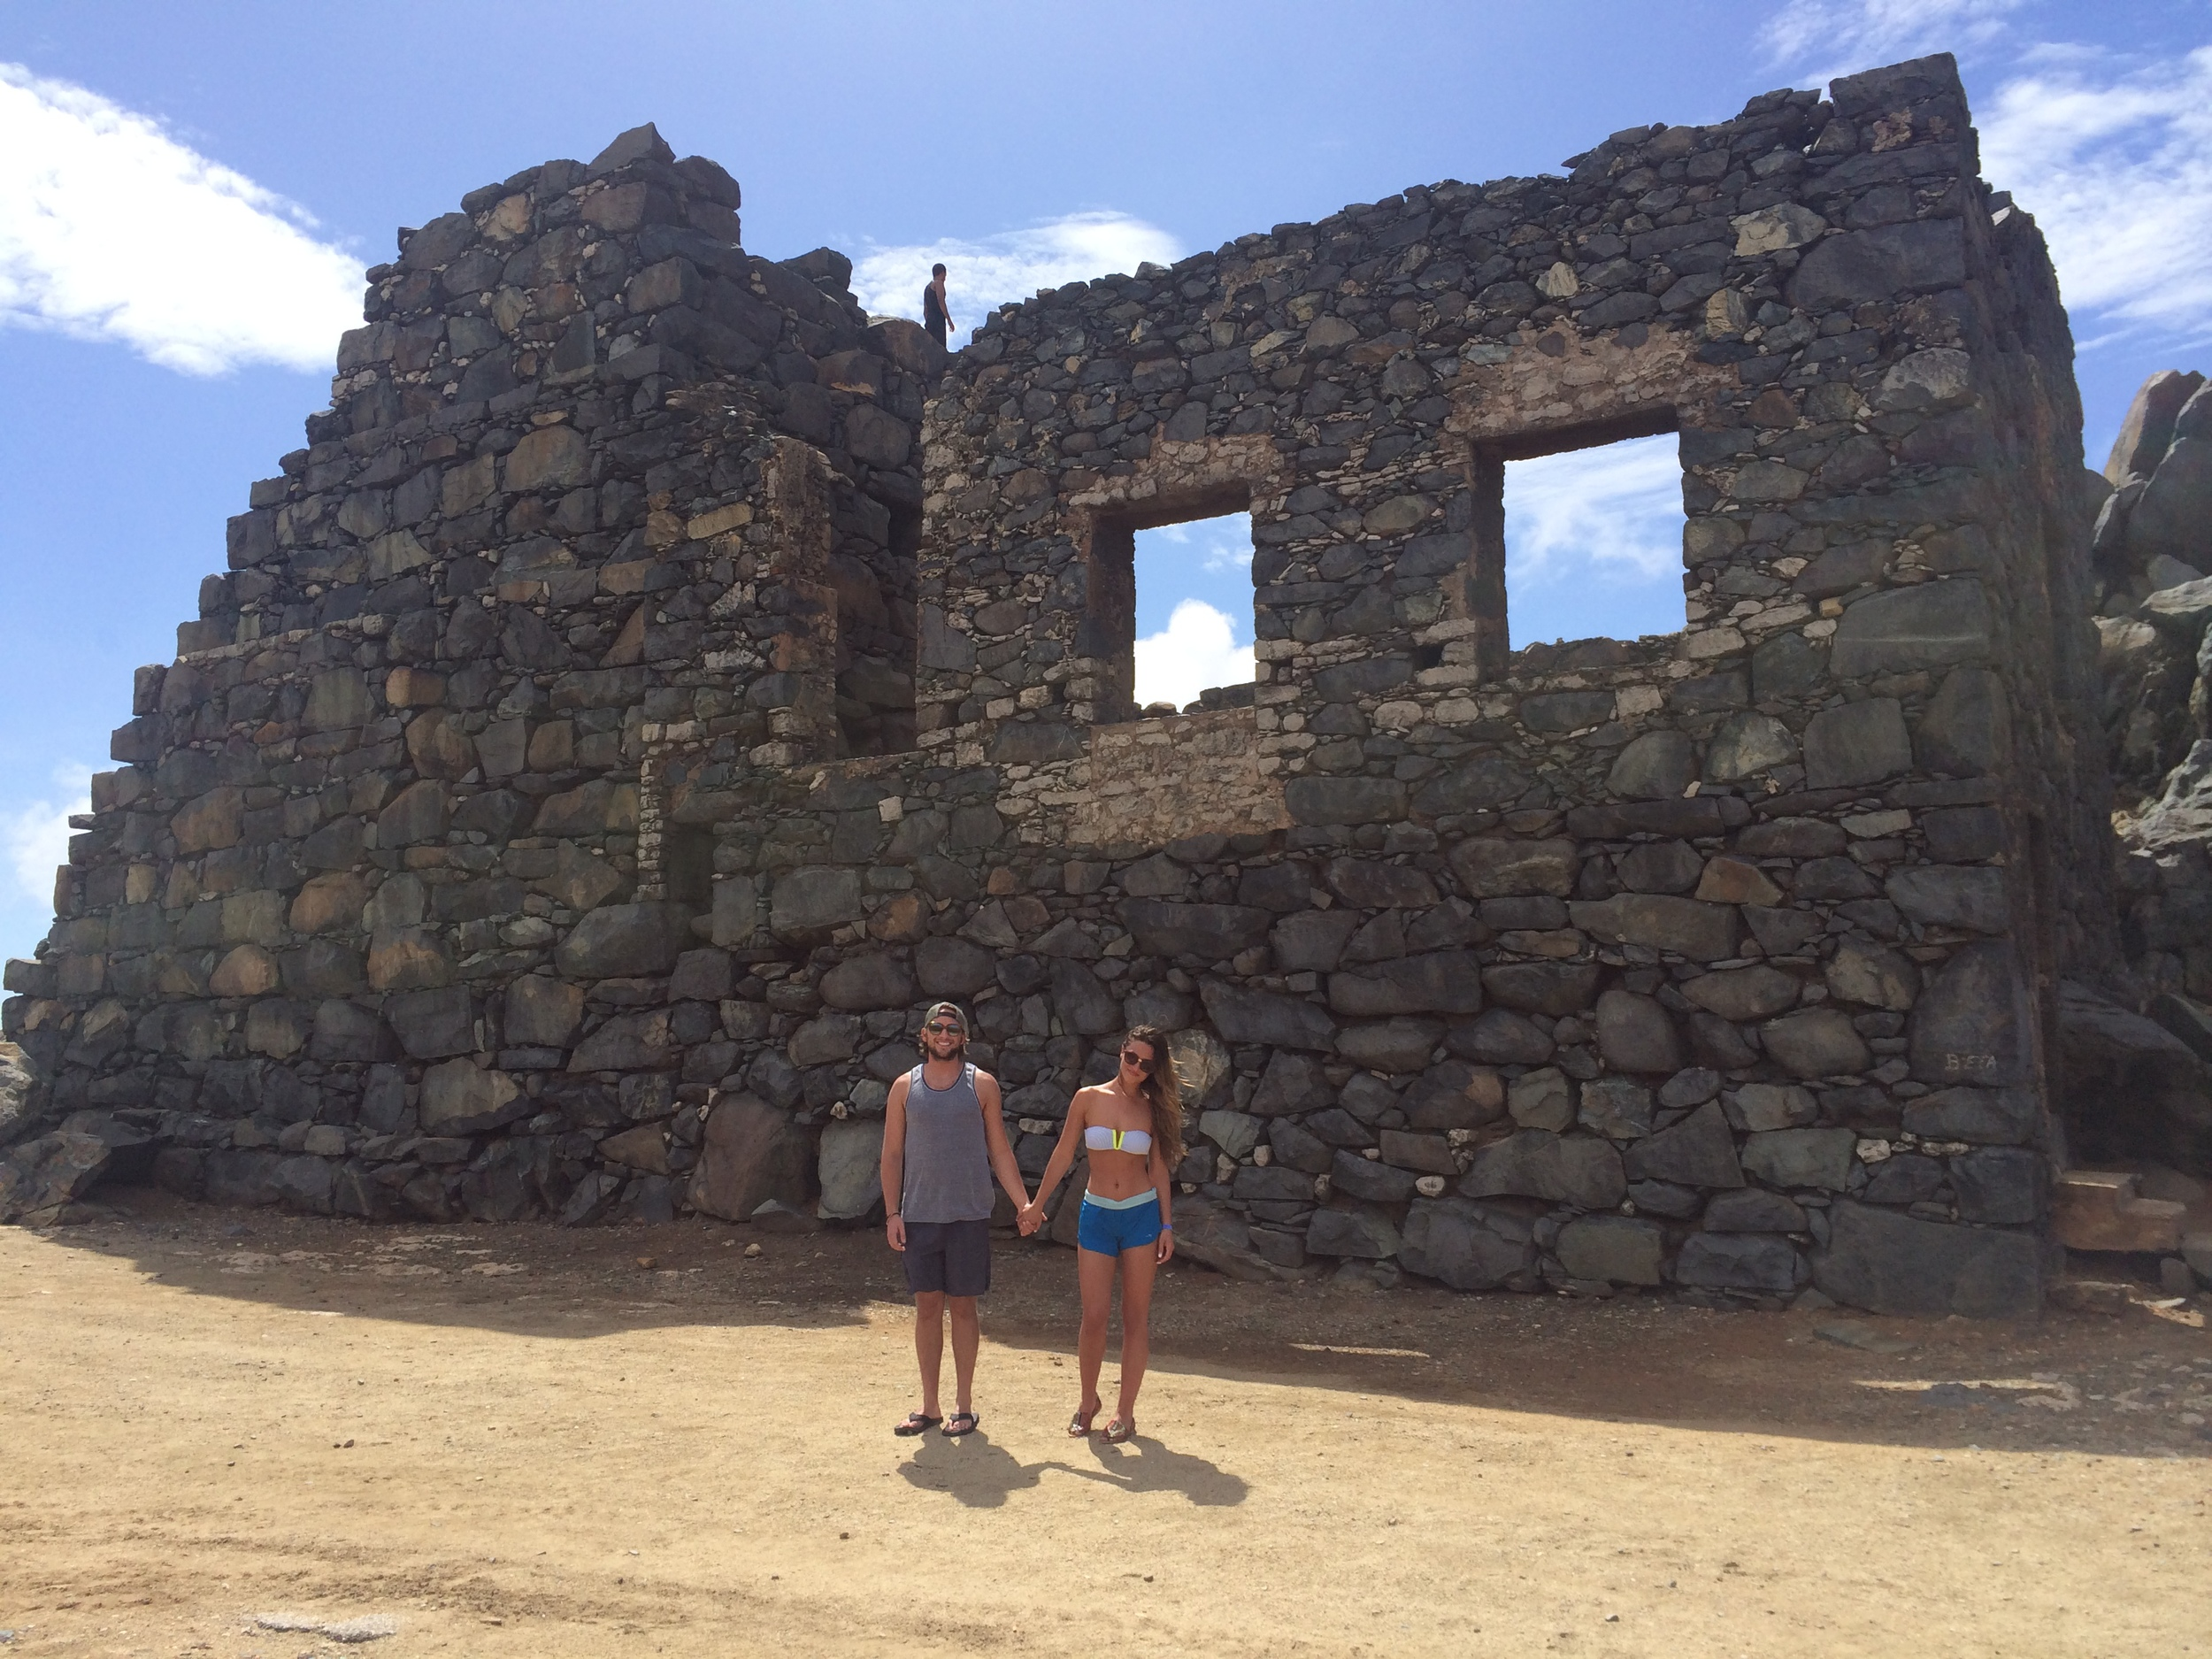 Exploring ruins.